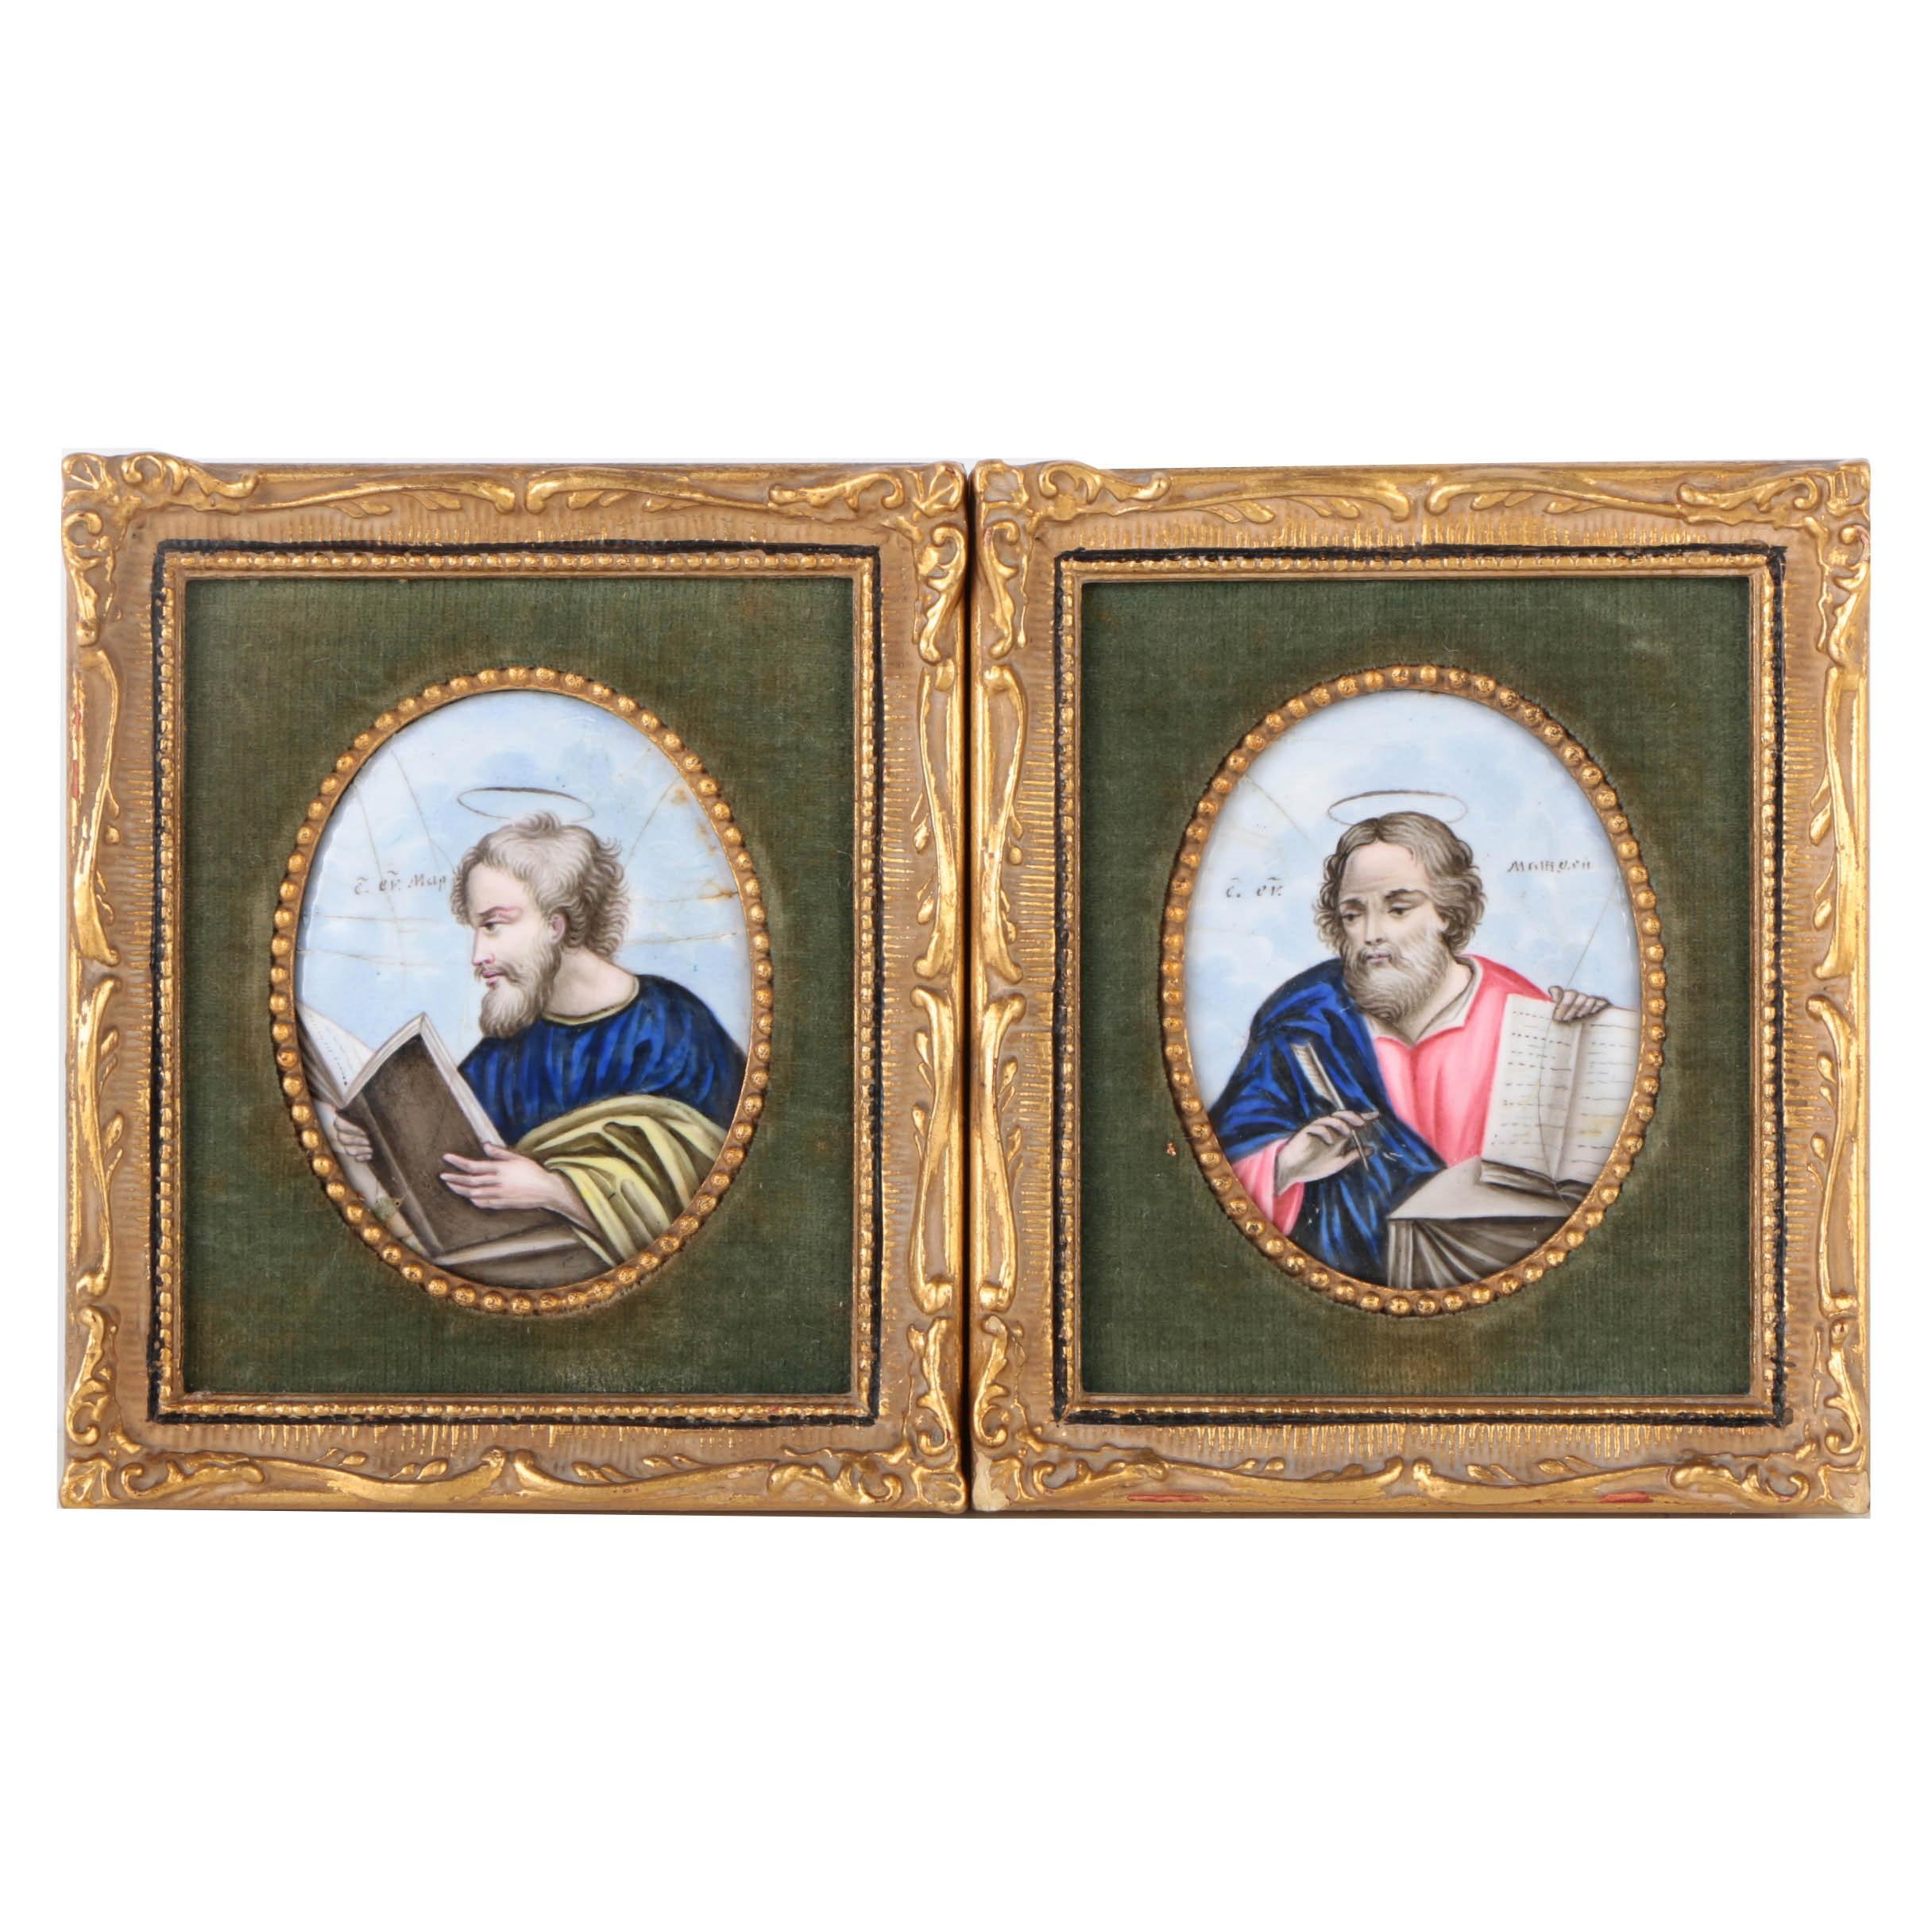 Pair of Enamel Miniature Portraits